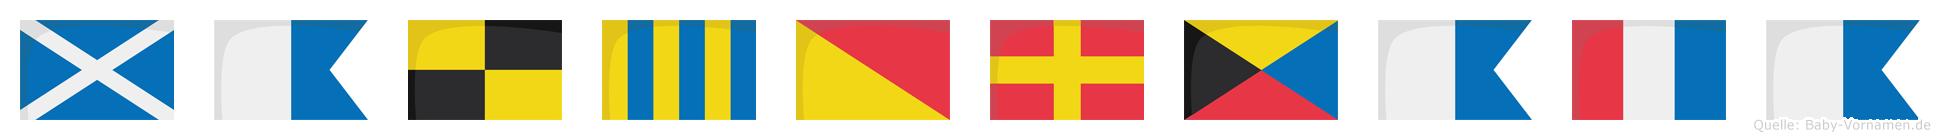 Malgorzata im Flaggenalphabet